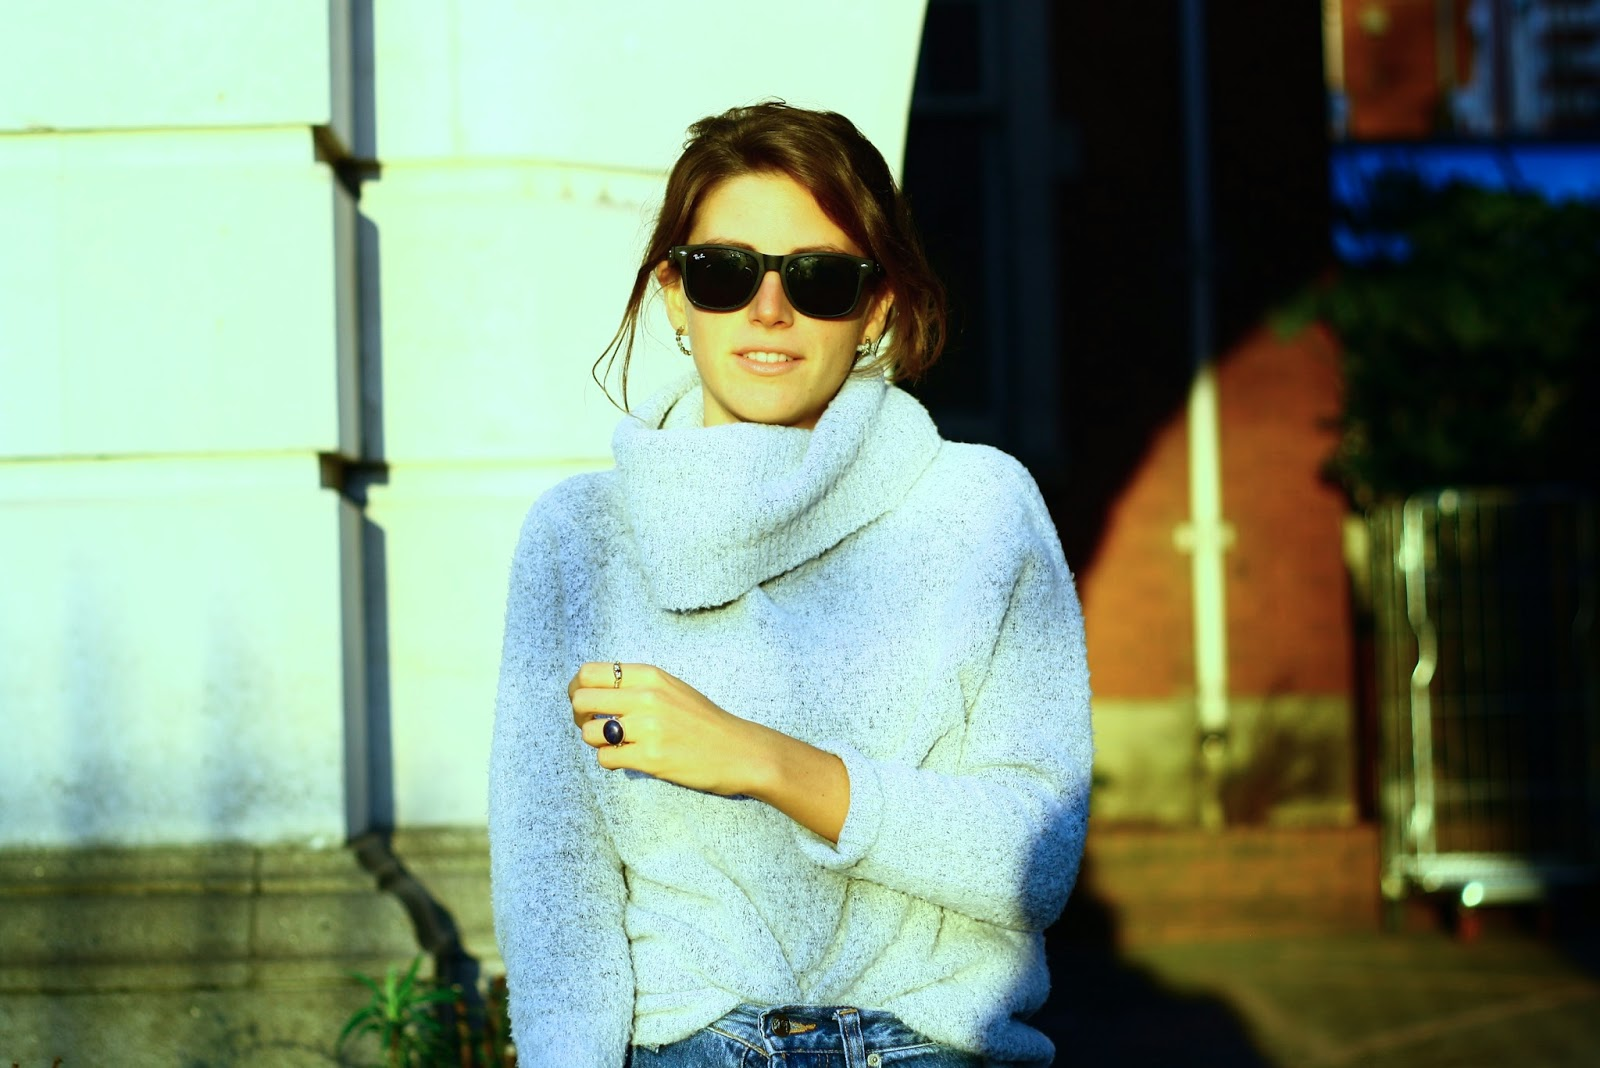 Vintage high street fashion blogger